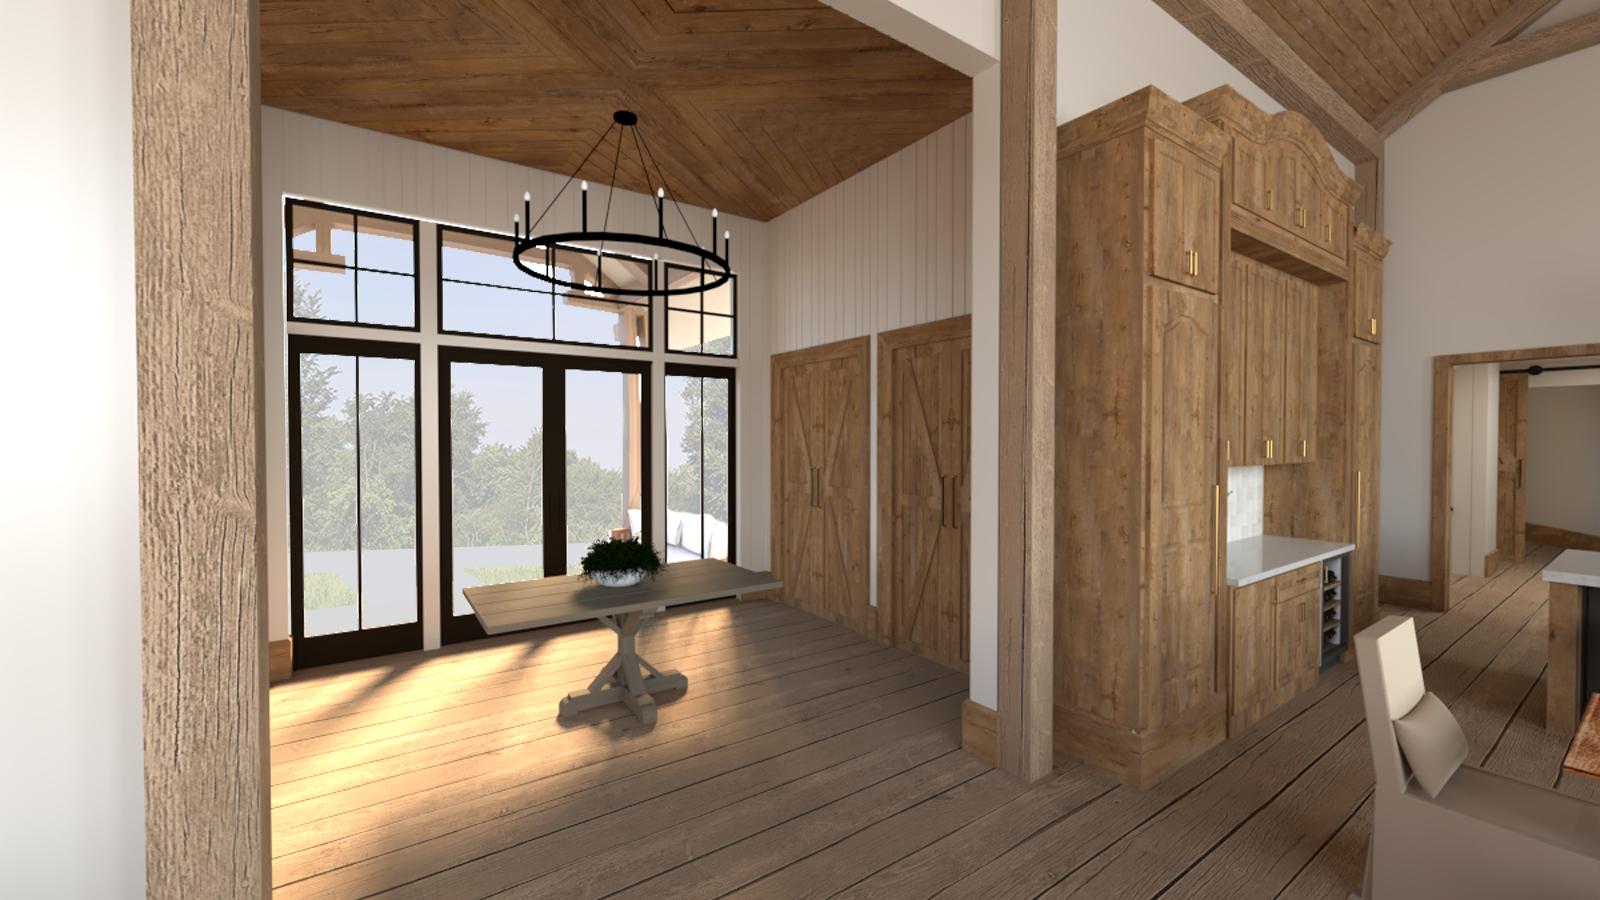 Fuchsia Design Grand Rapids MI Ceiling Design 166.png